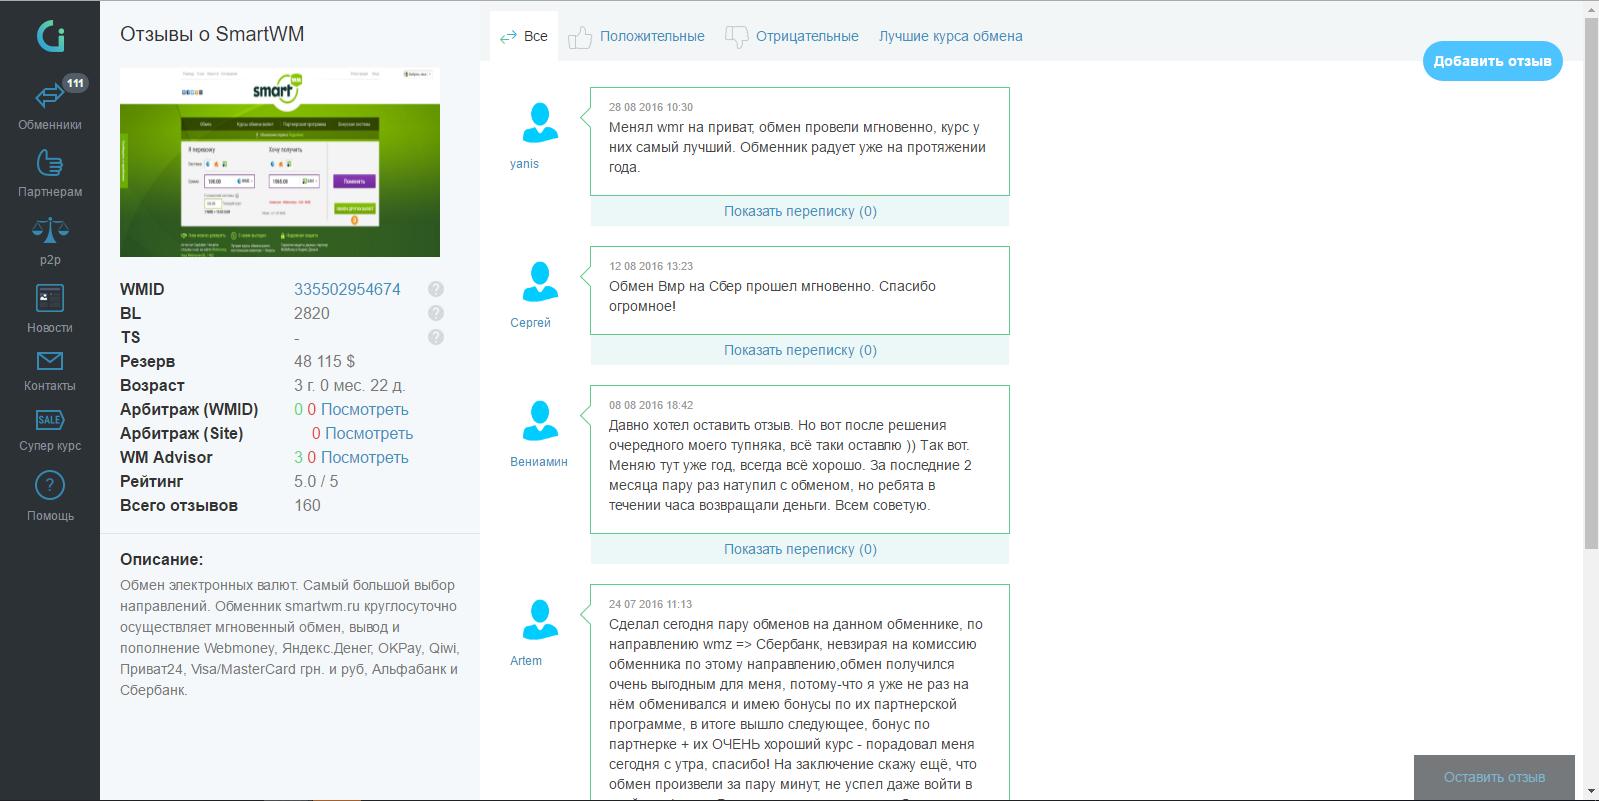 обменять webmoney changeinfo.ru